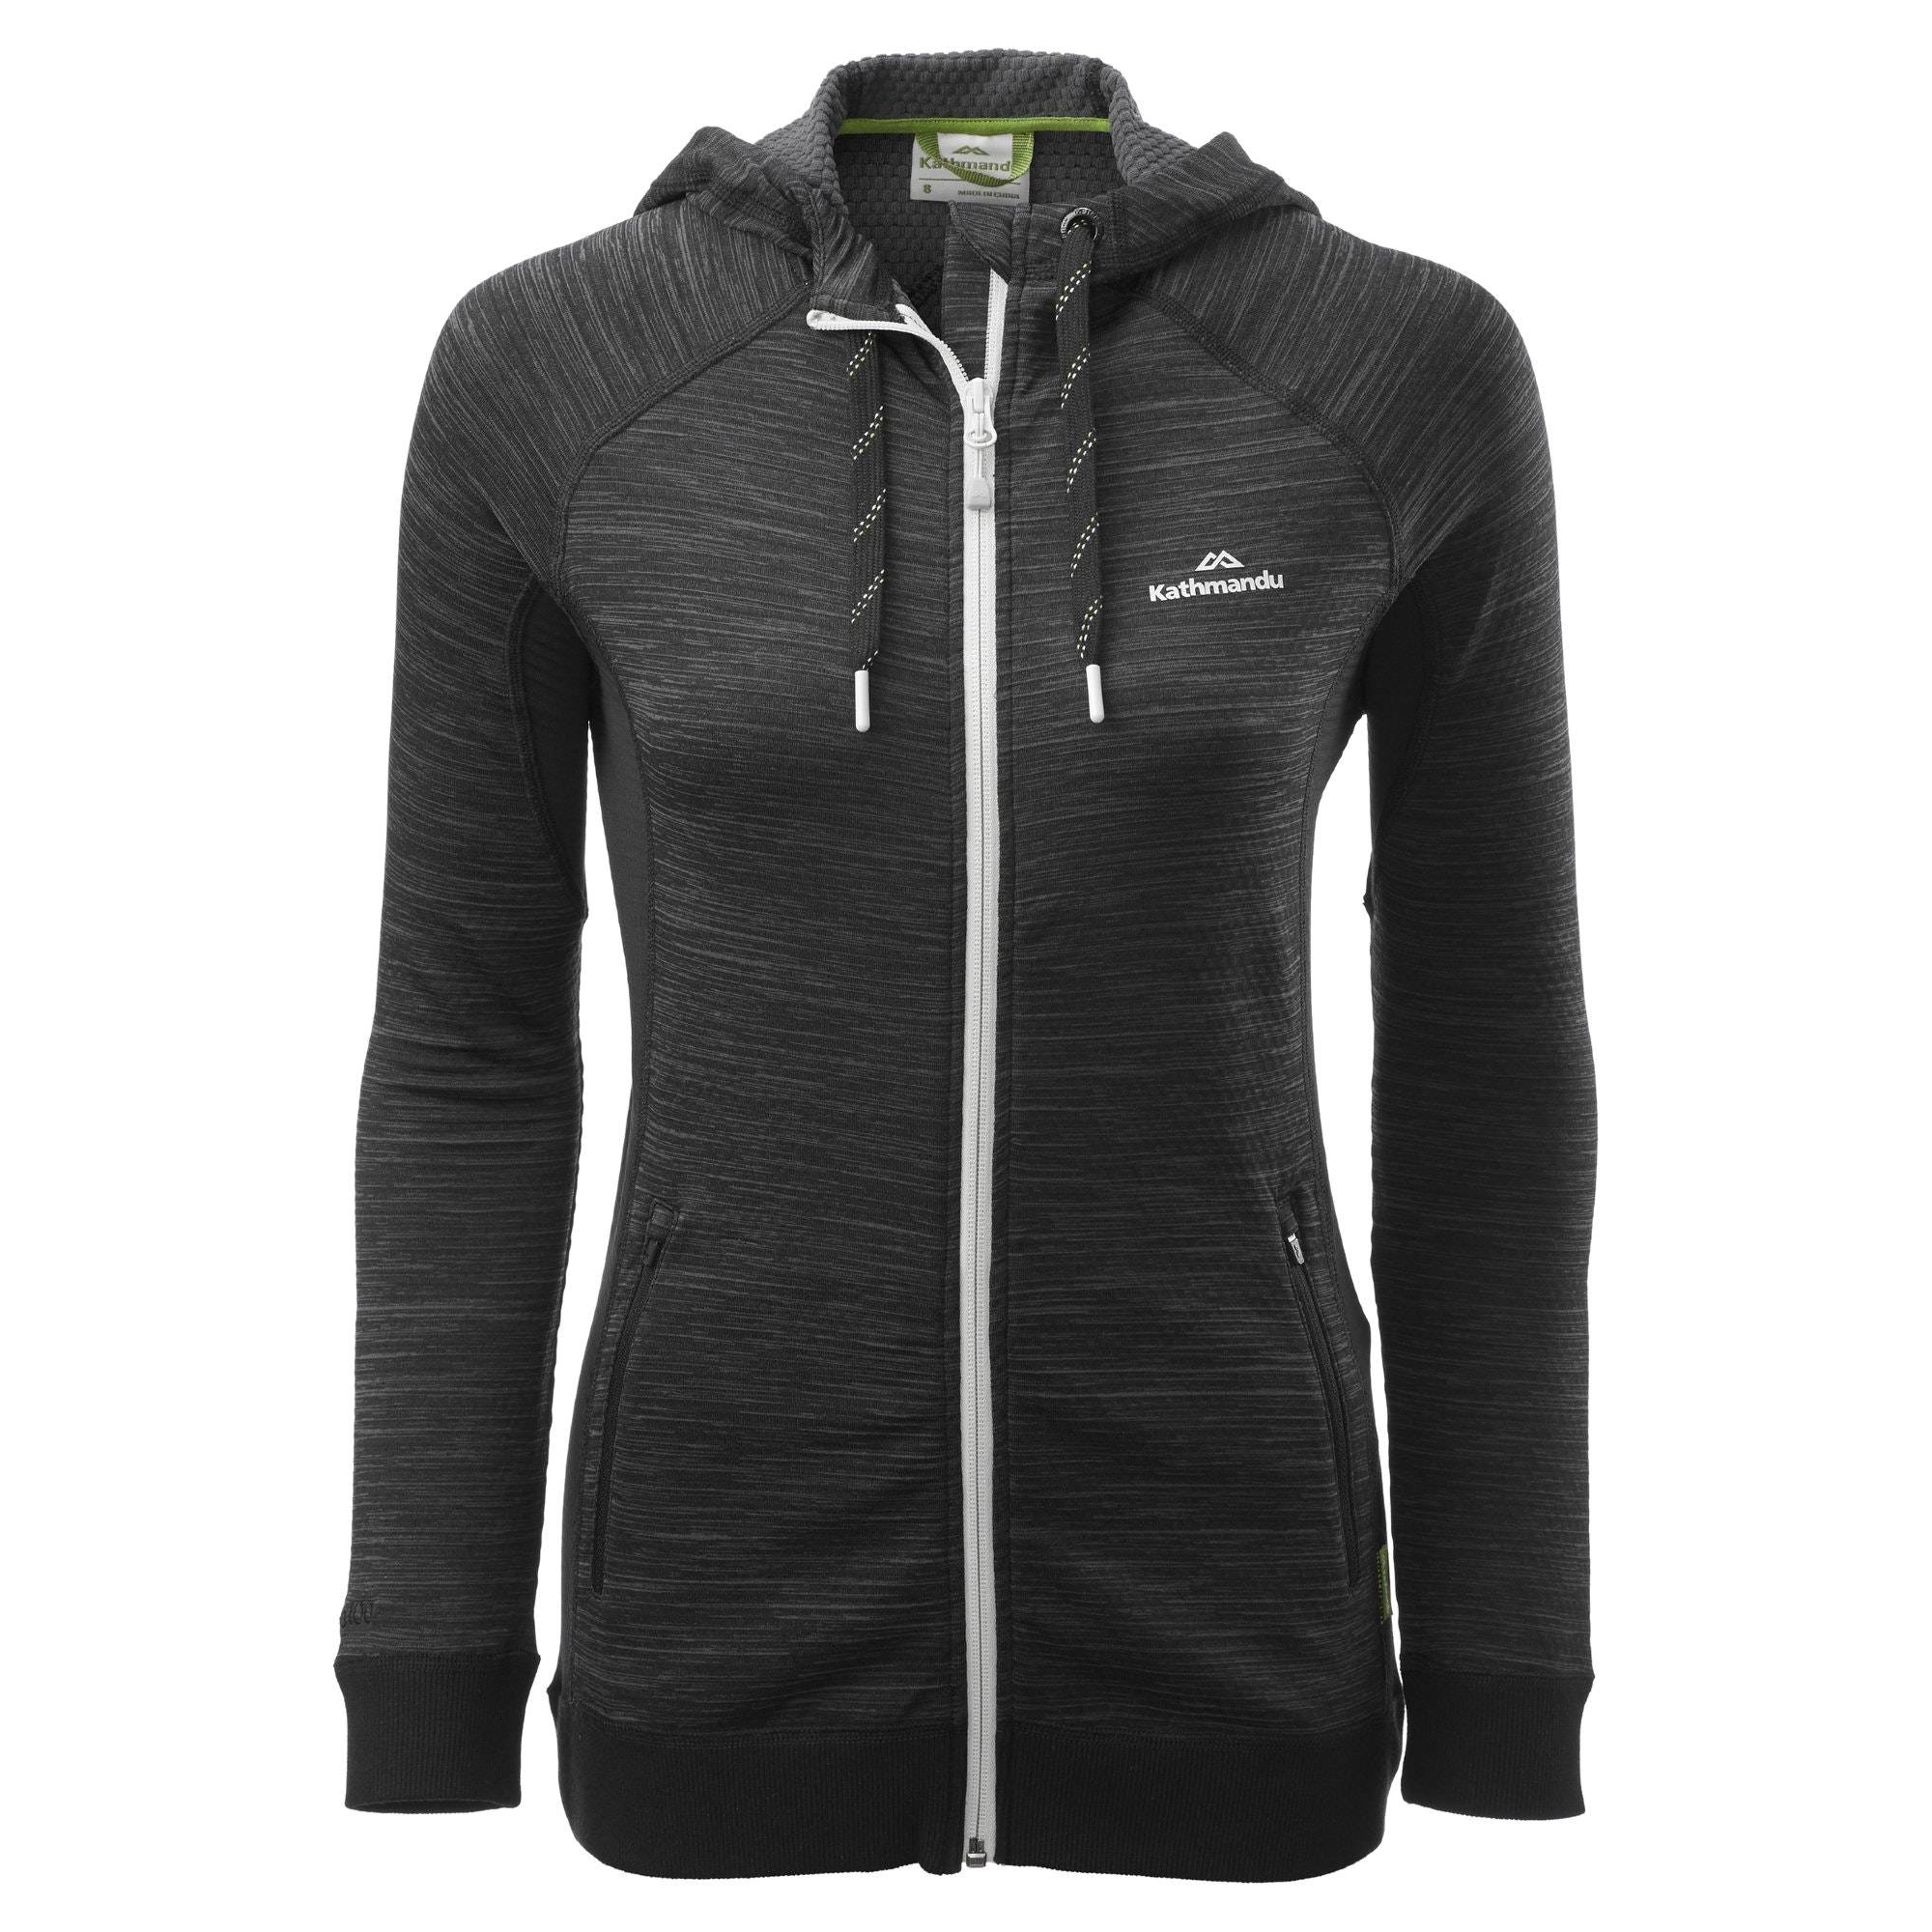 Kathmandu Acota Women's Hooded Fleece Jacket  - Granite Marle/Black - Size: US 4